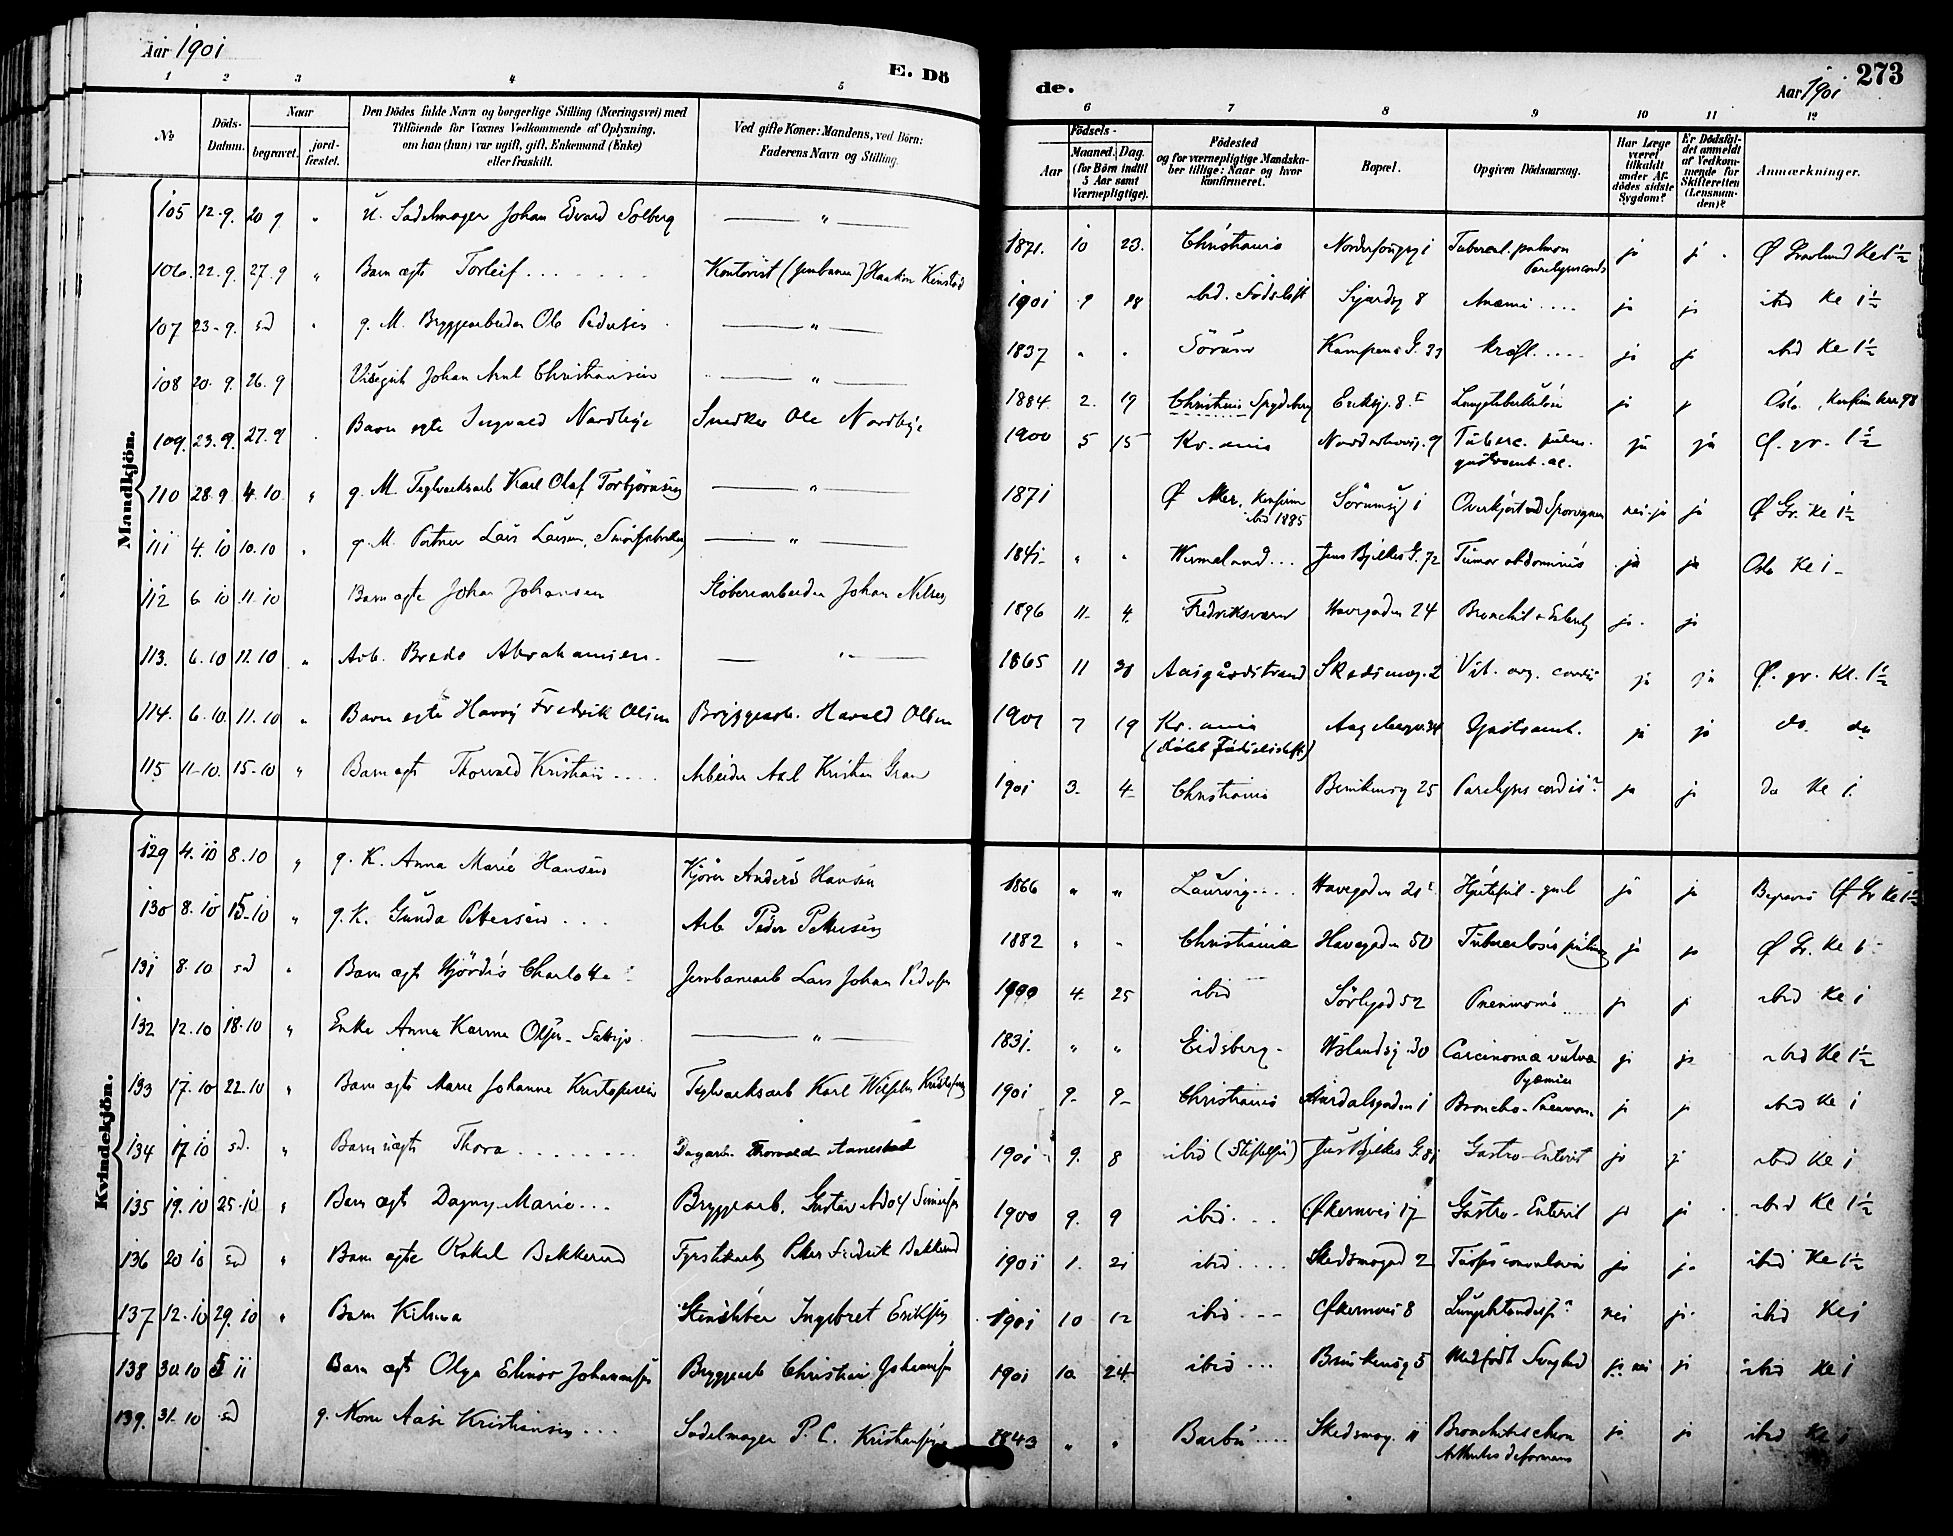 SAO, Kampen prestekontor Kirkebøker, F/Fa/L0008: Ministerialbok nr. I 8, 1892-1902, s. 273